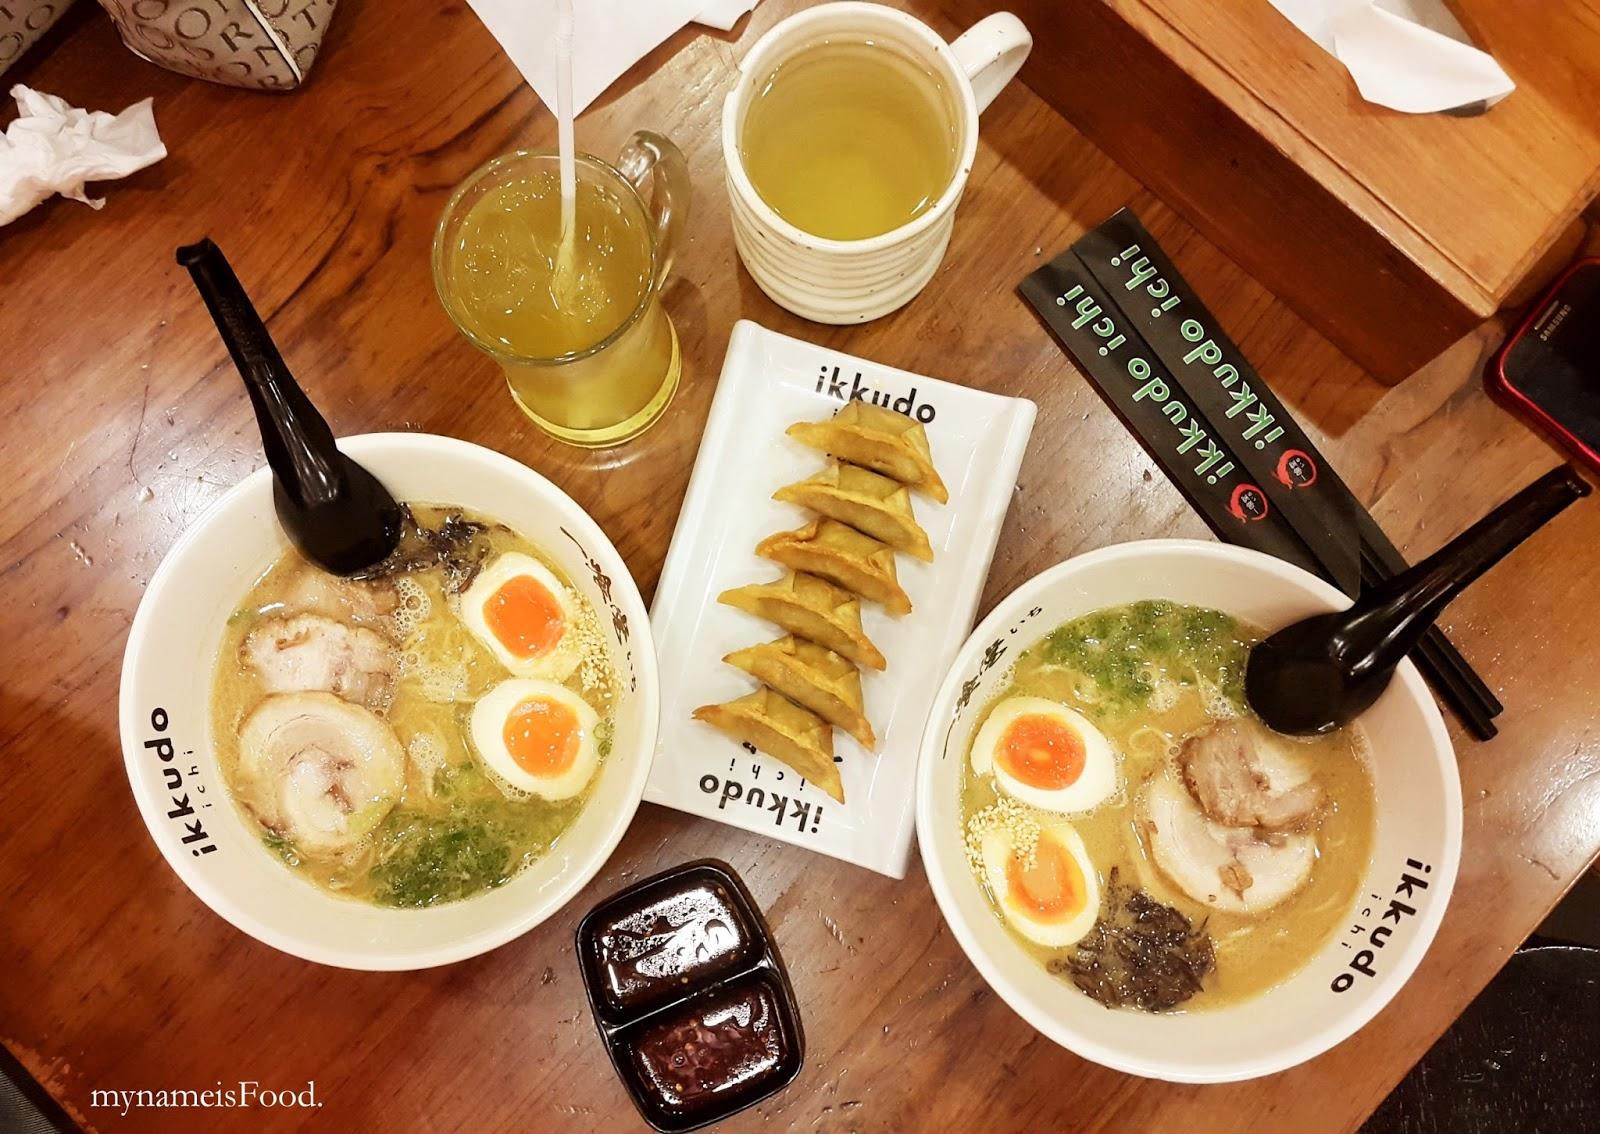 Ikkudo Ichi (c) my name is Food